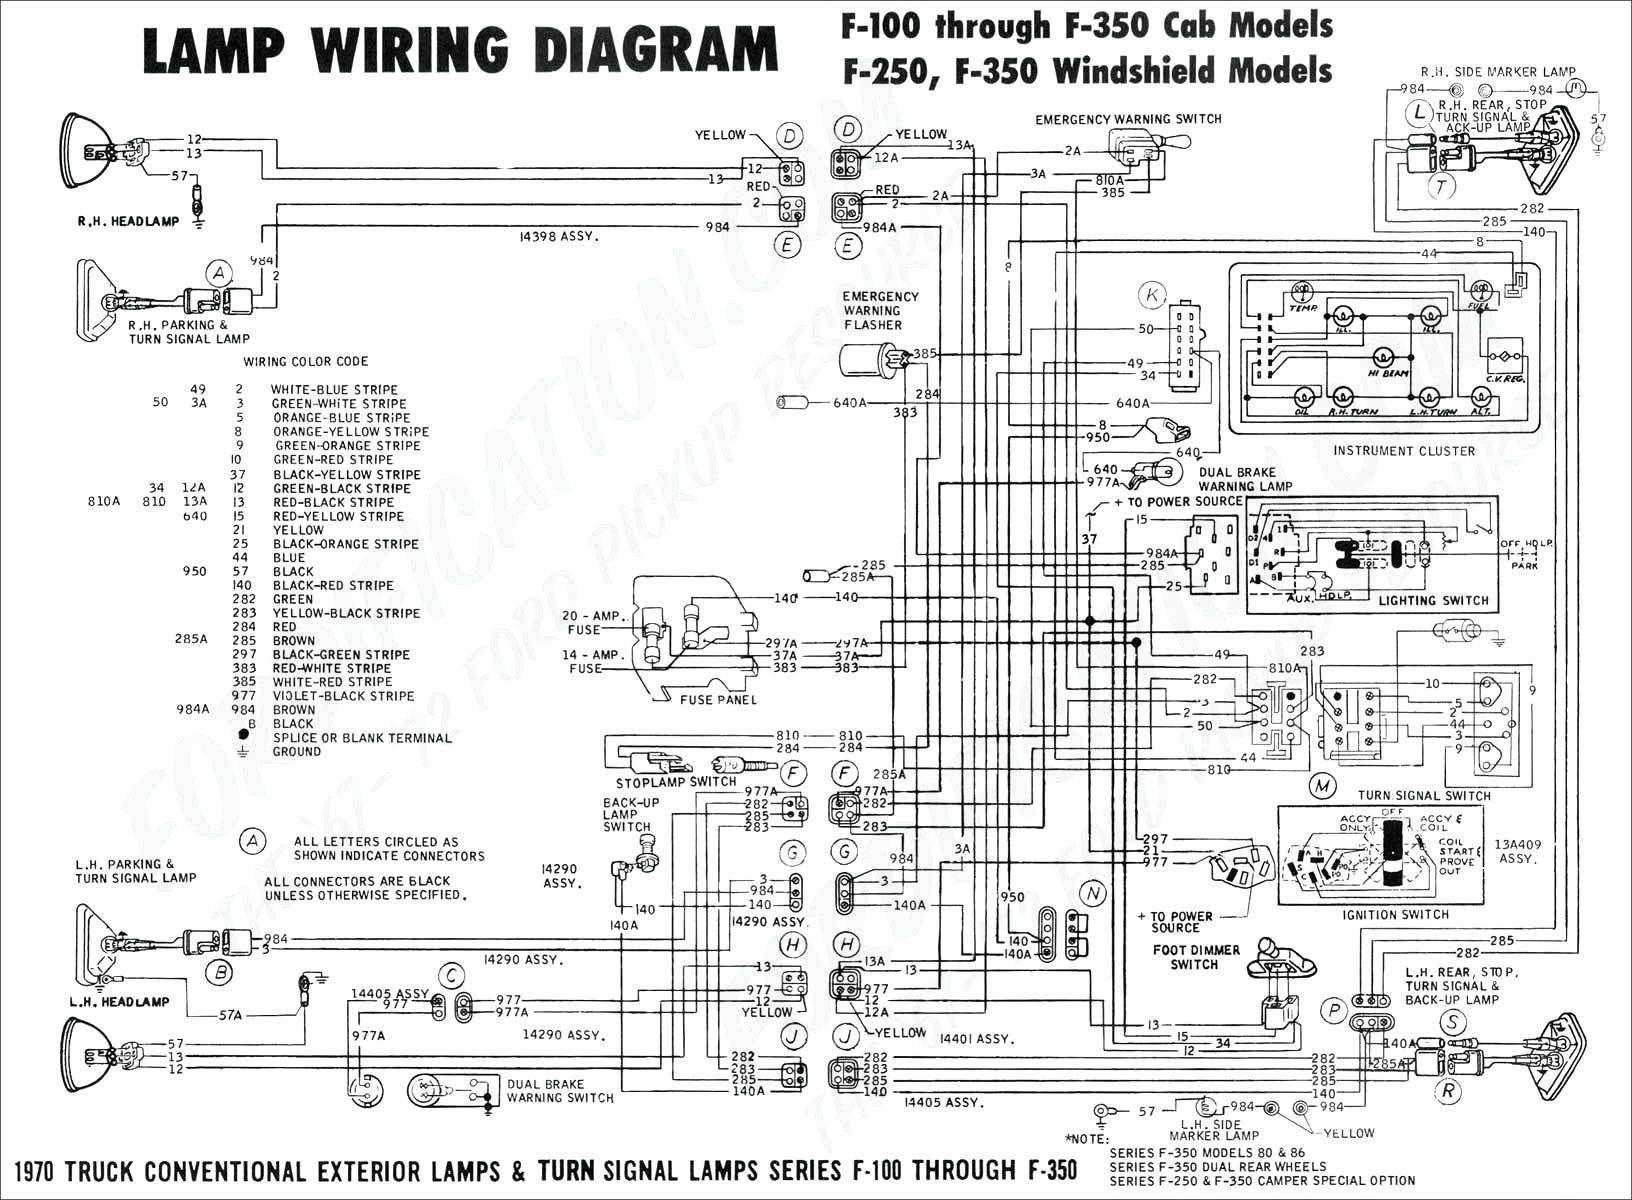 car engine oil flow diagram my wiring diagram ford f53 diagram trusted wiring diagrams rh kroud co car oil filter diagram oil filter flow diagram